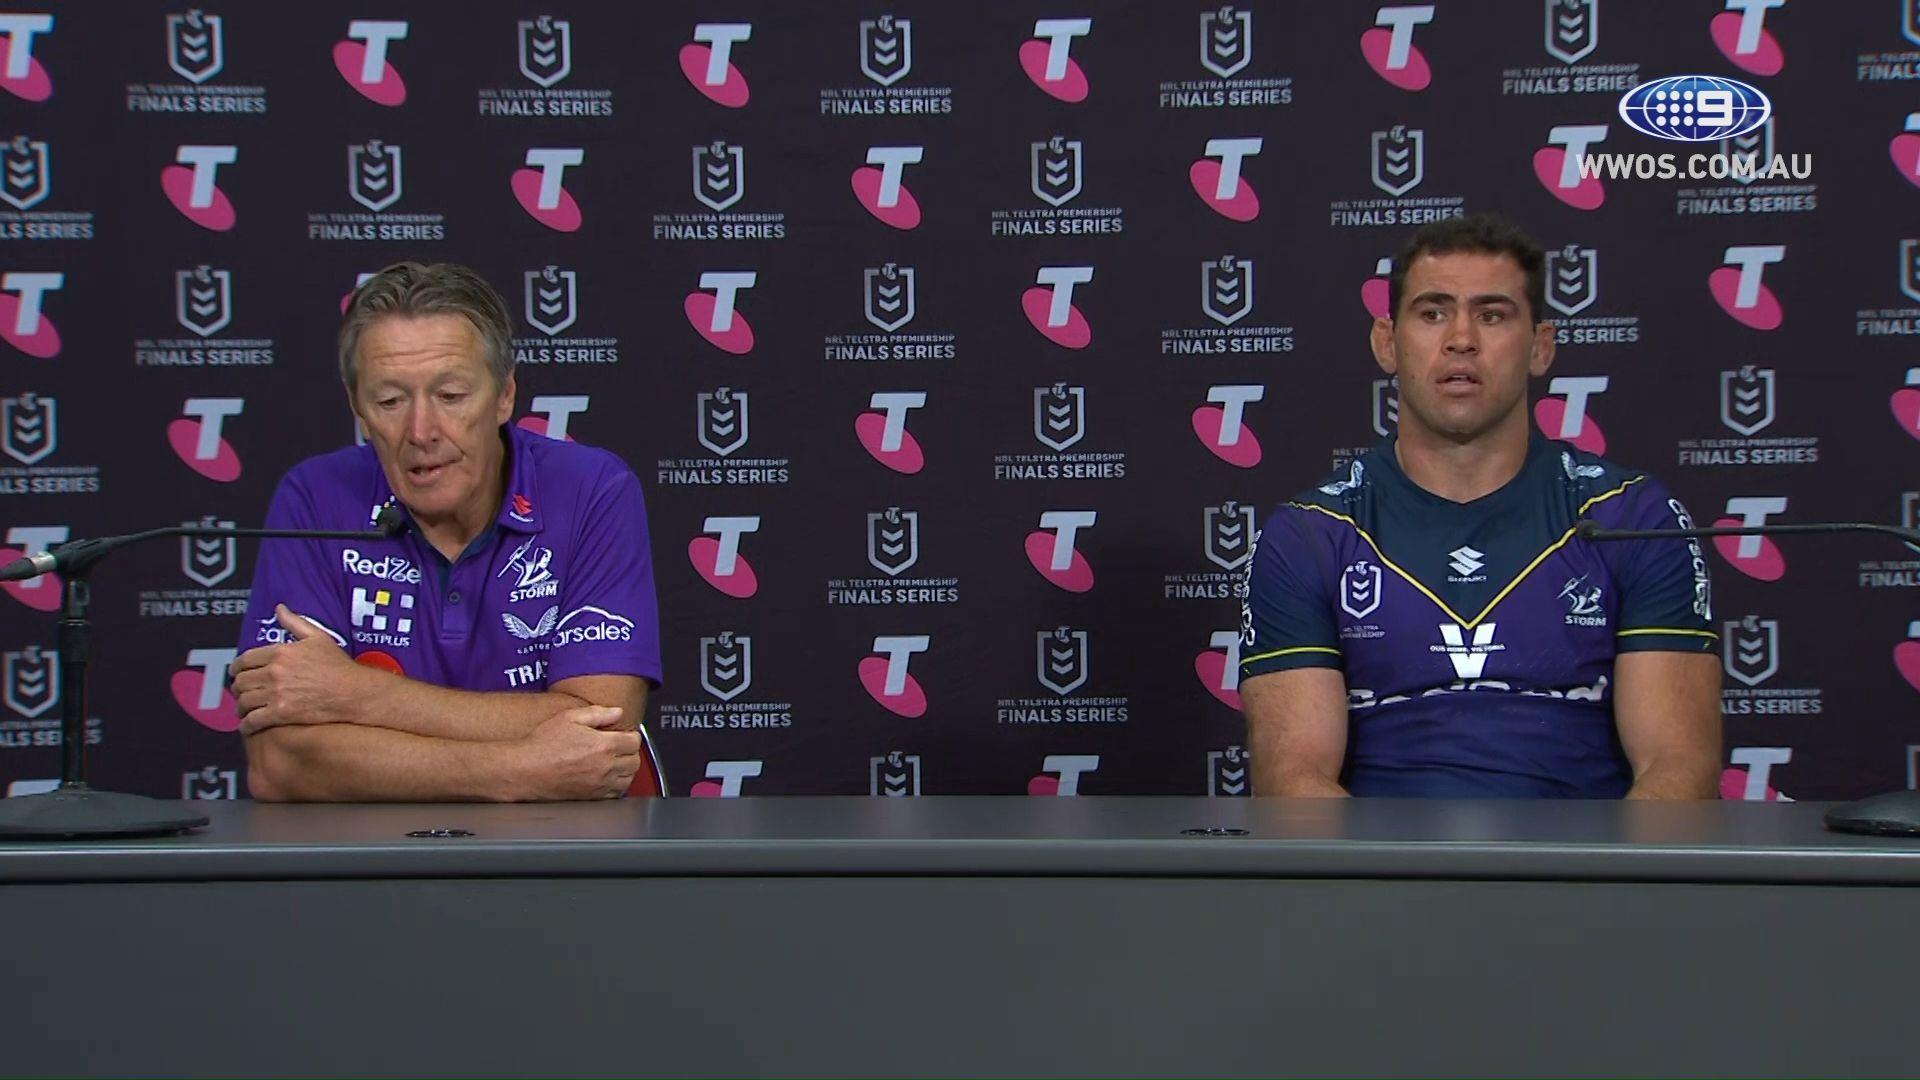 Deflated Craig Bellamy says Melbourne Storm left their worst 'til last